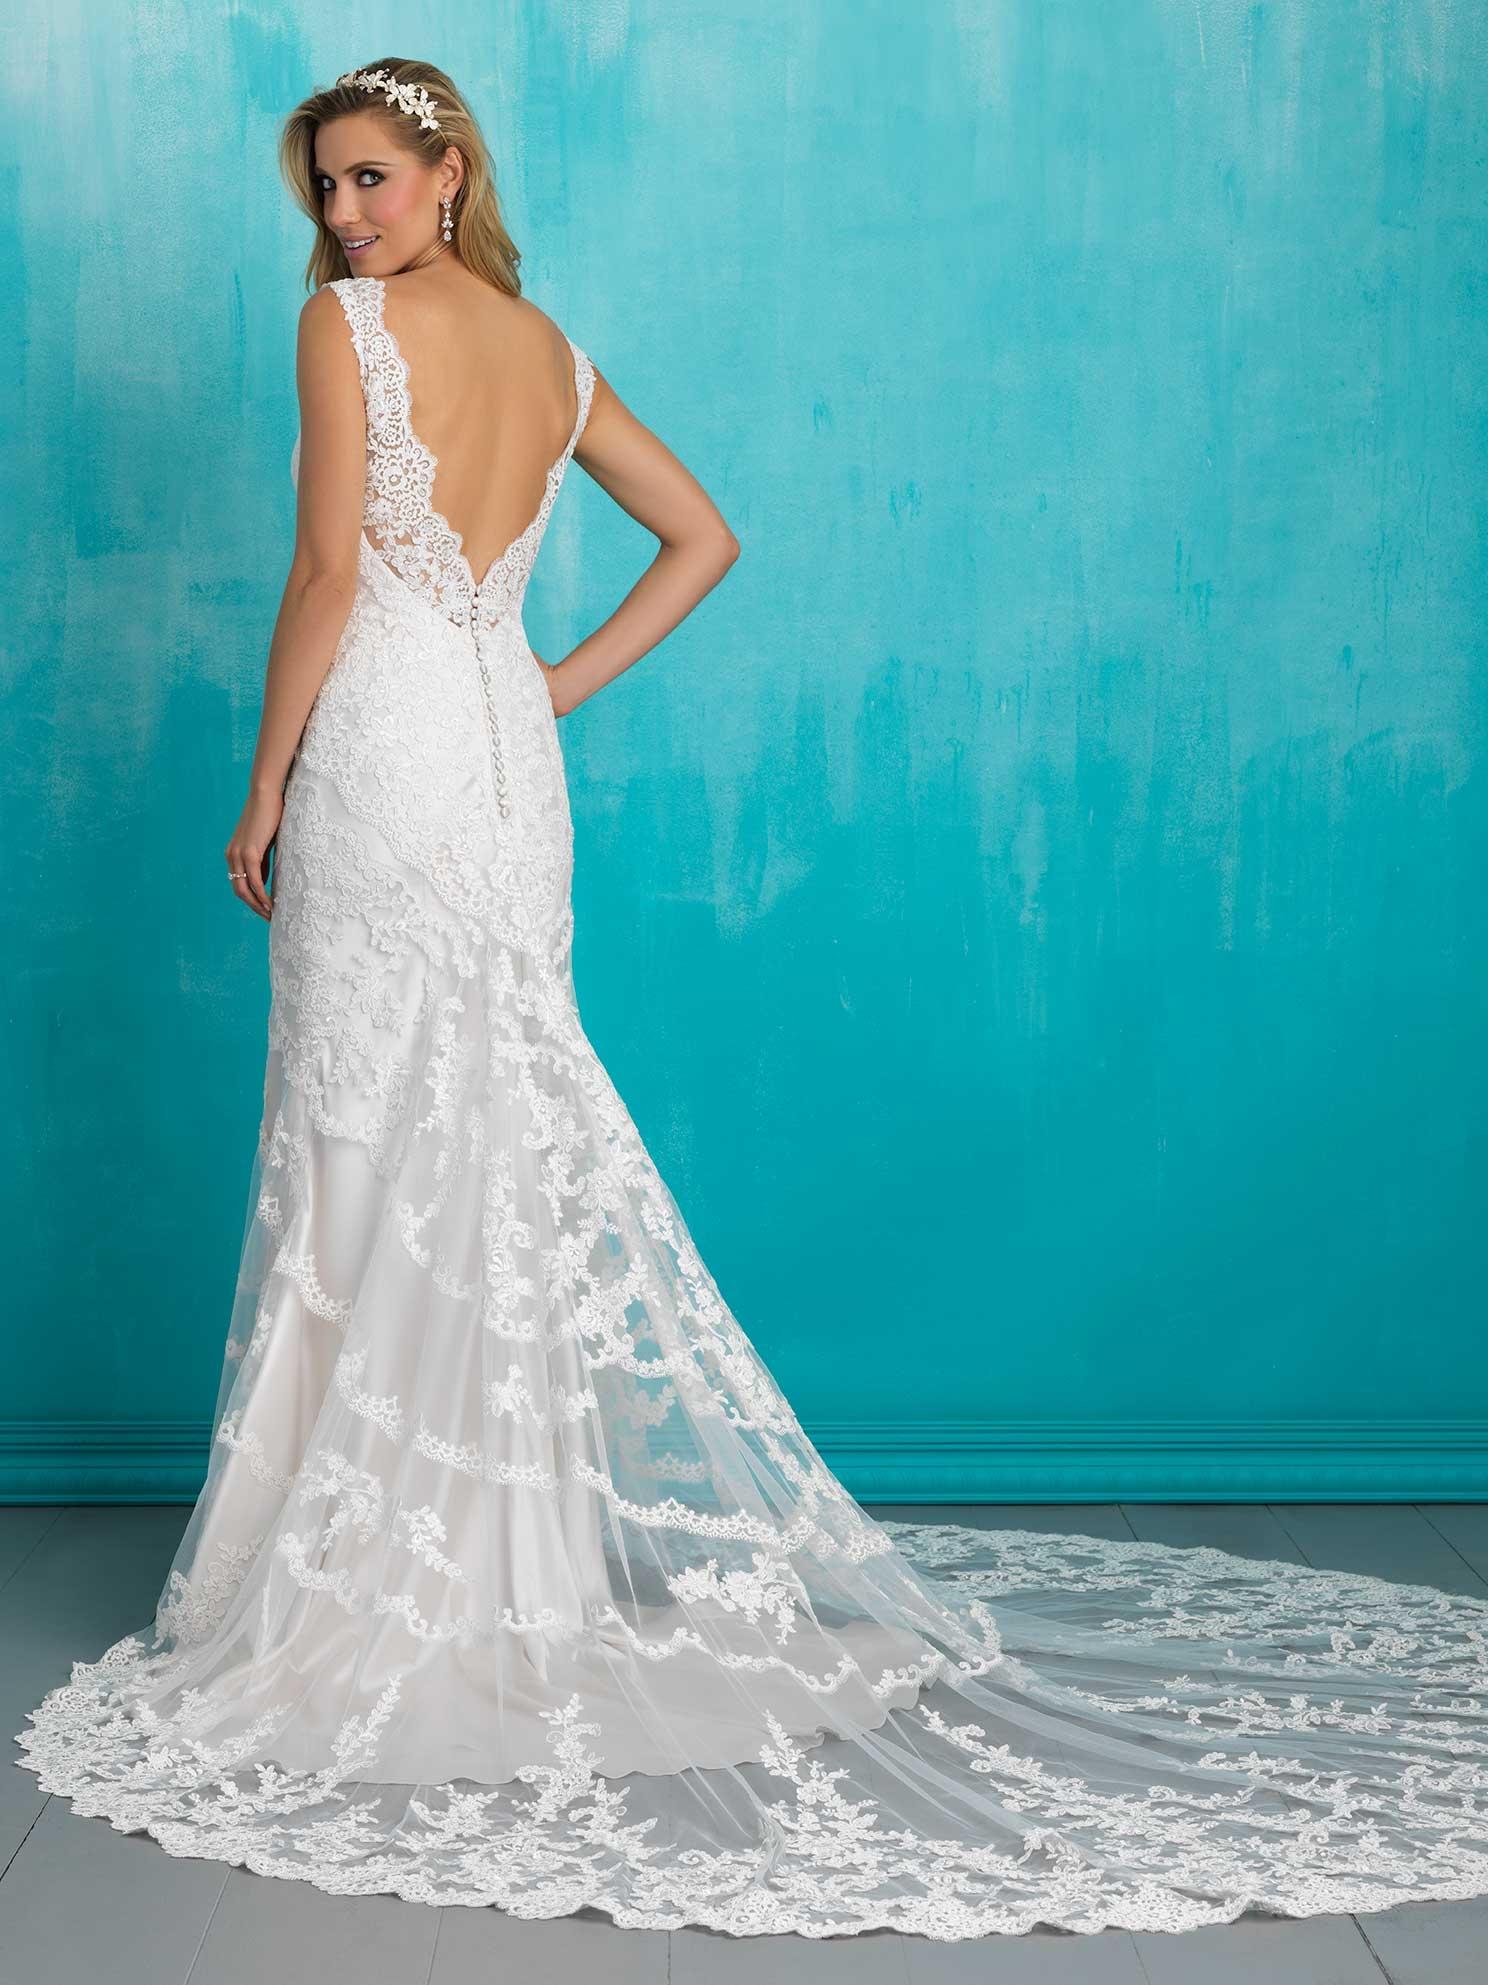 Modern Price Range Of Allure Bridal Gowns Elaboration - All Wedding ...